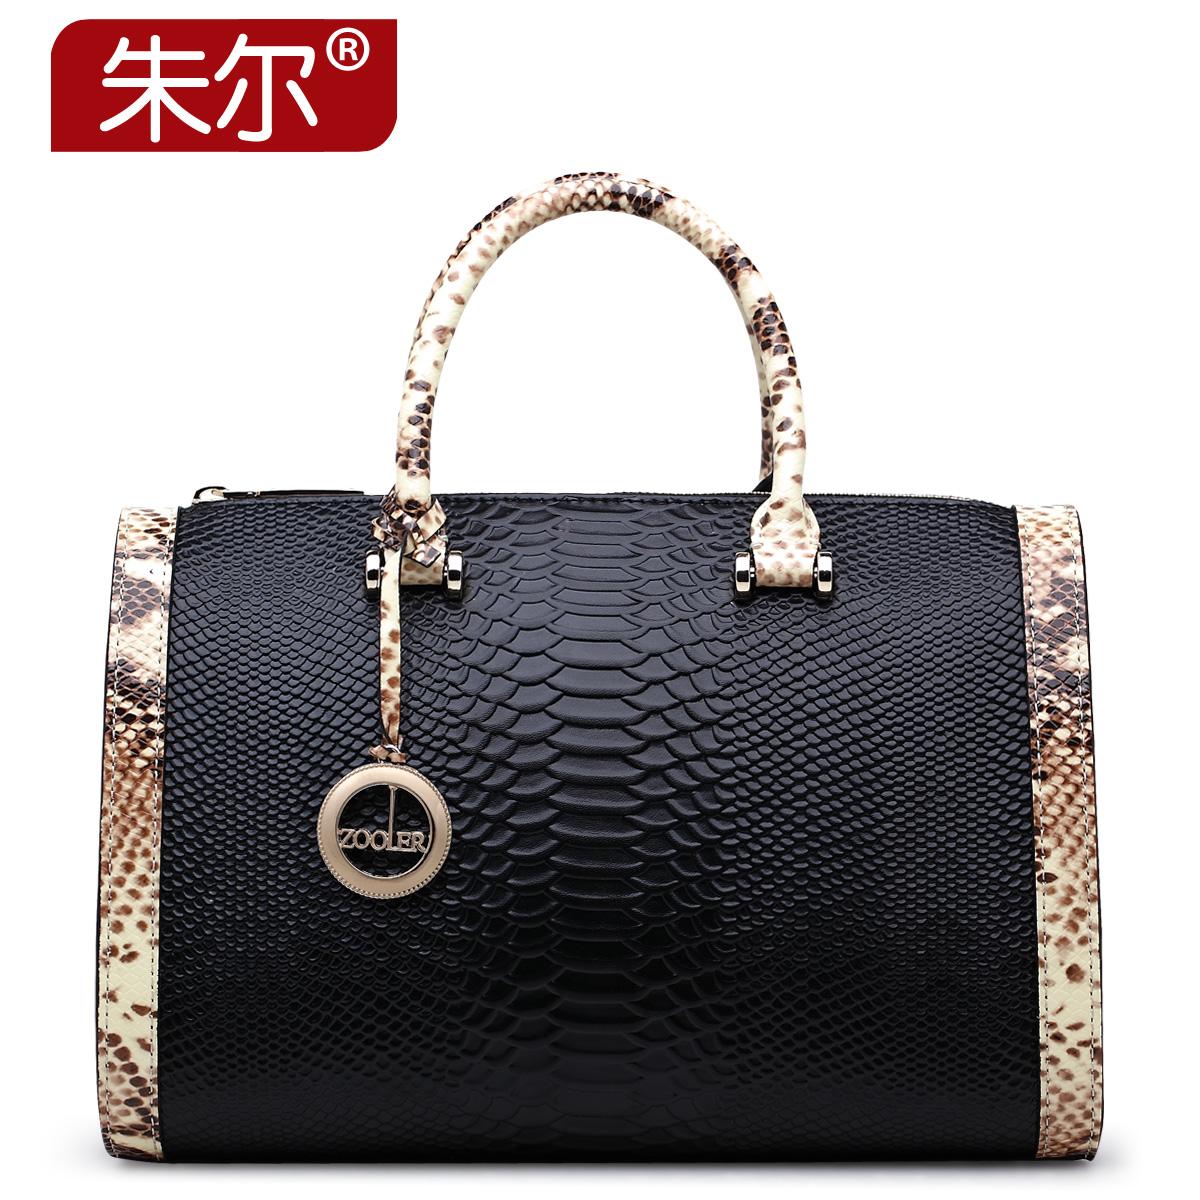 Bags handbags women famous brand cowhide handbag bucket bag genuine leather shoulder bag bolsas femininas